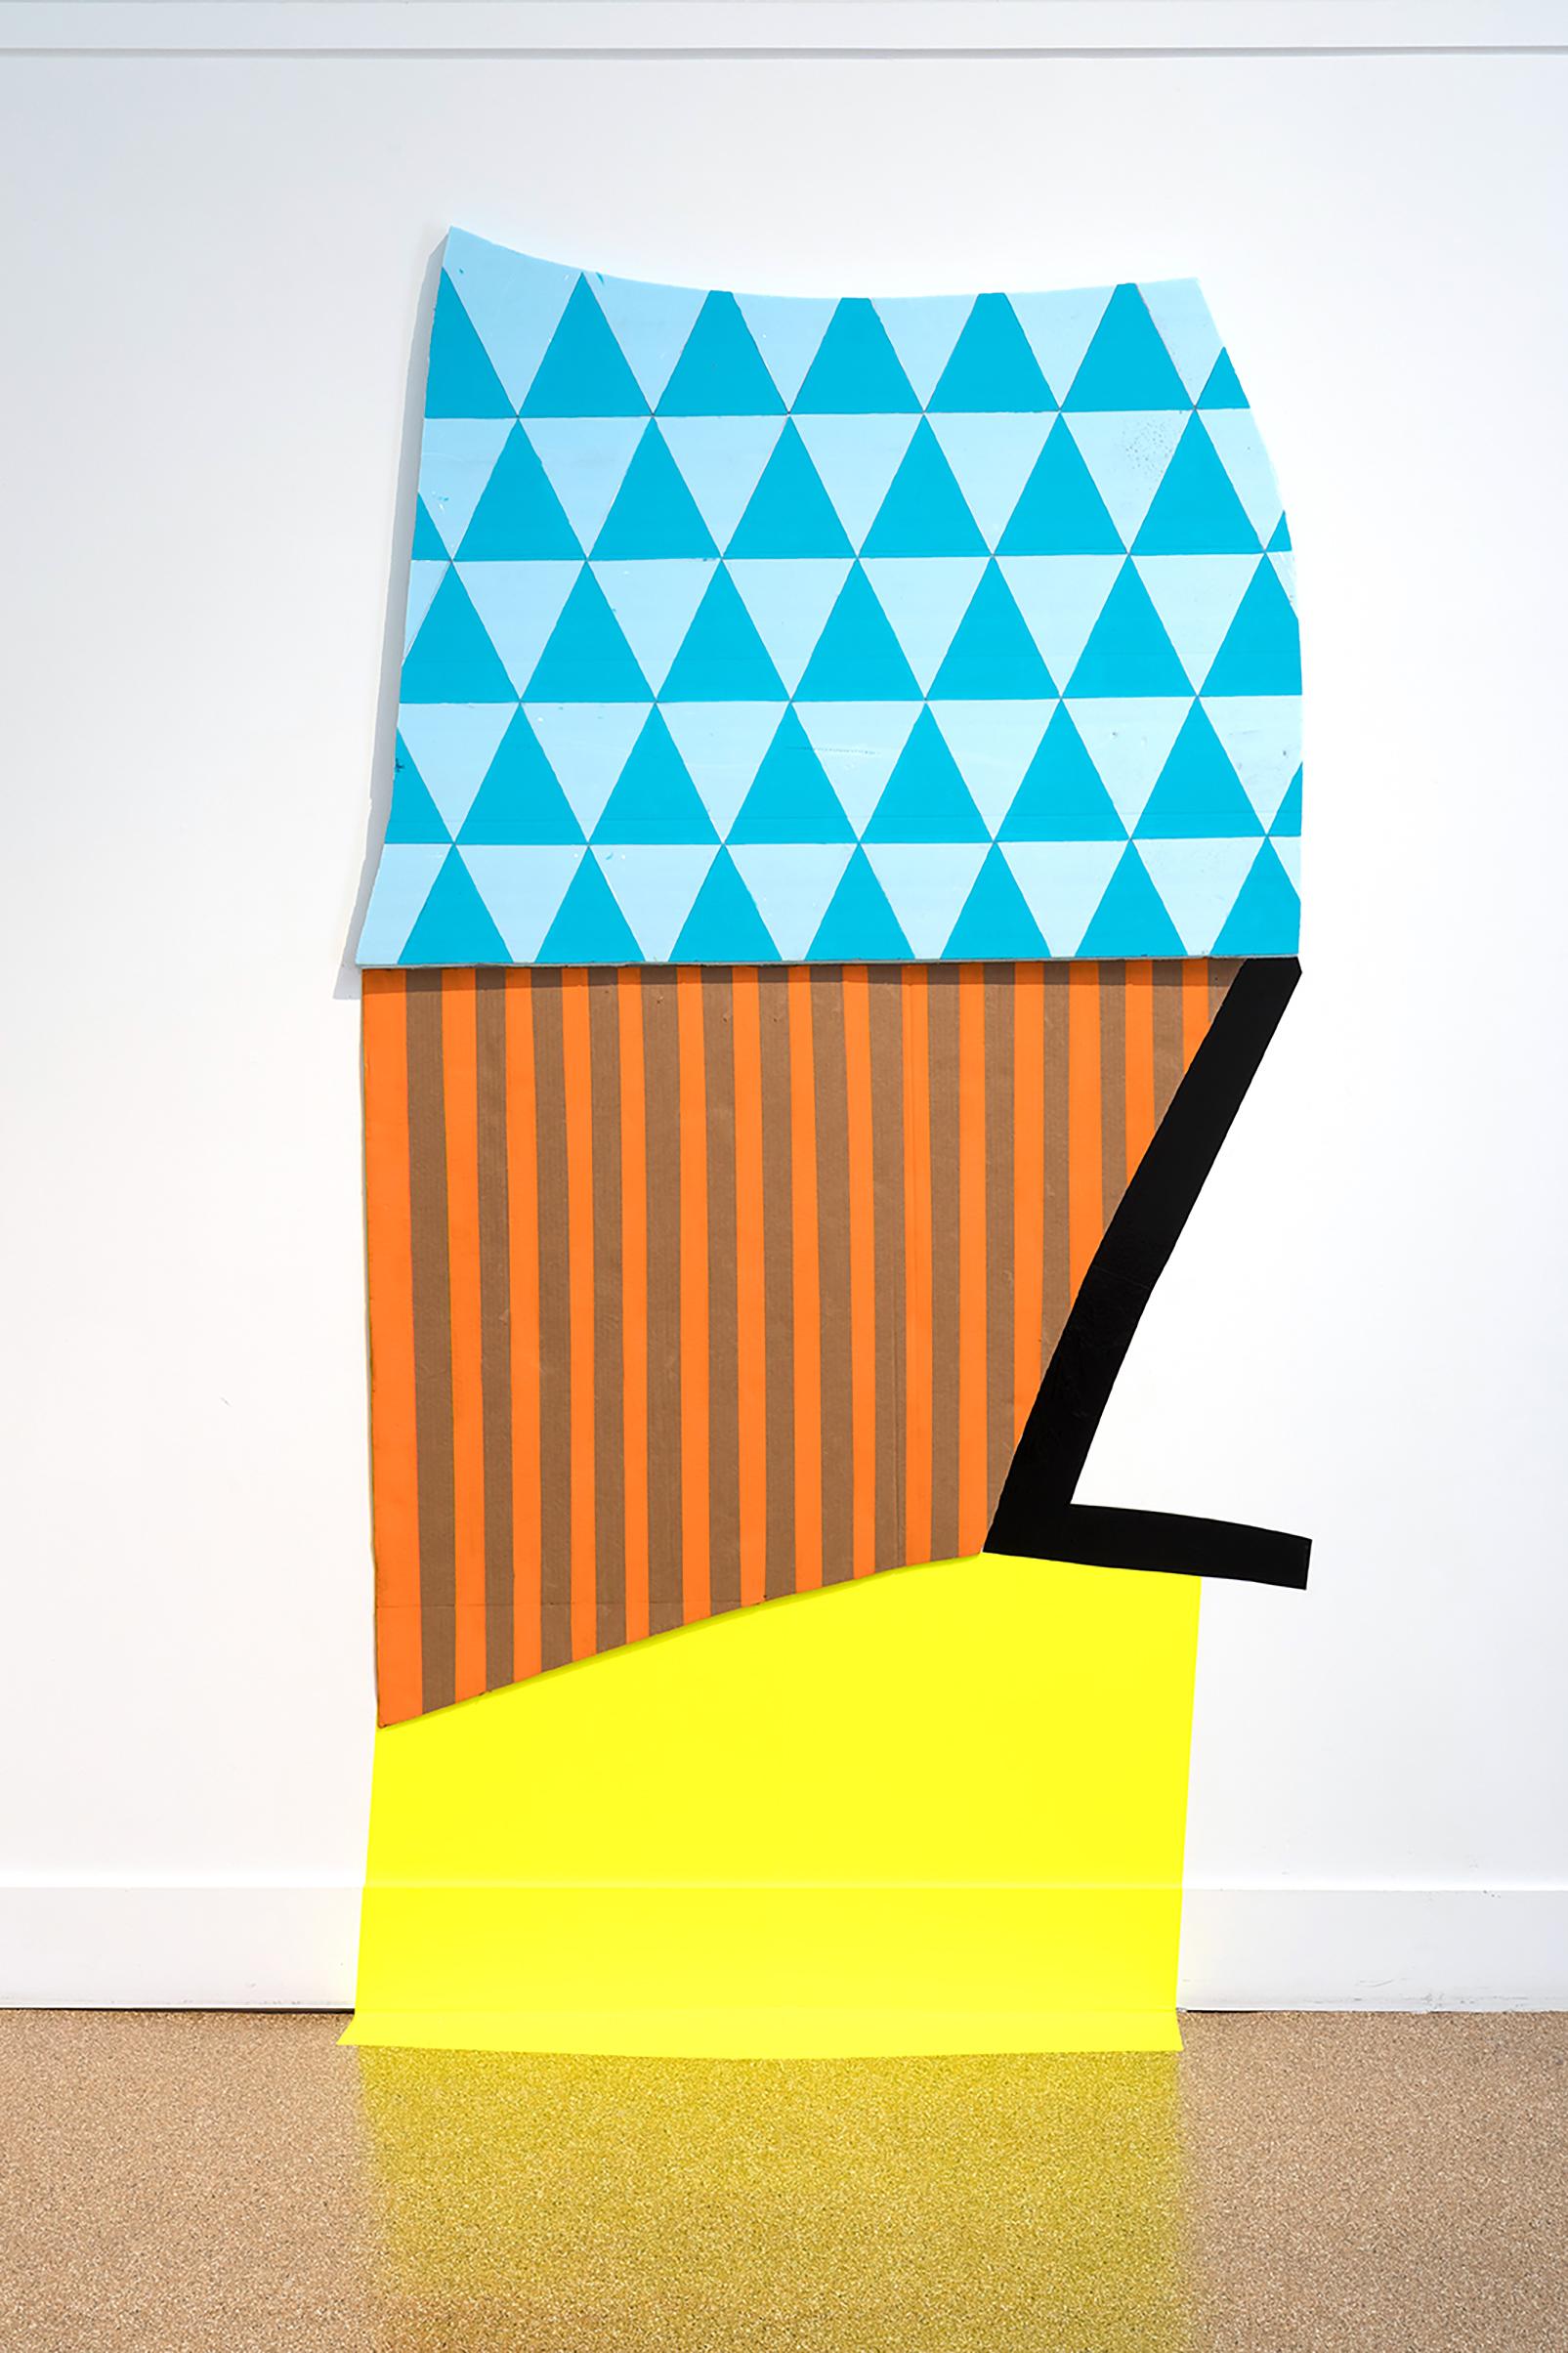 Stripes and Triangles, 2018, foam, cardboard, vinyl, acrylic, 96 x 54 x 2 in, $4,000